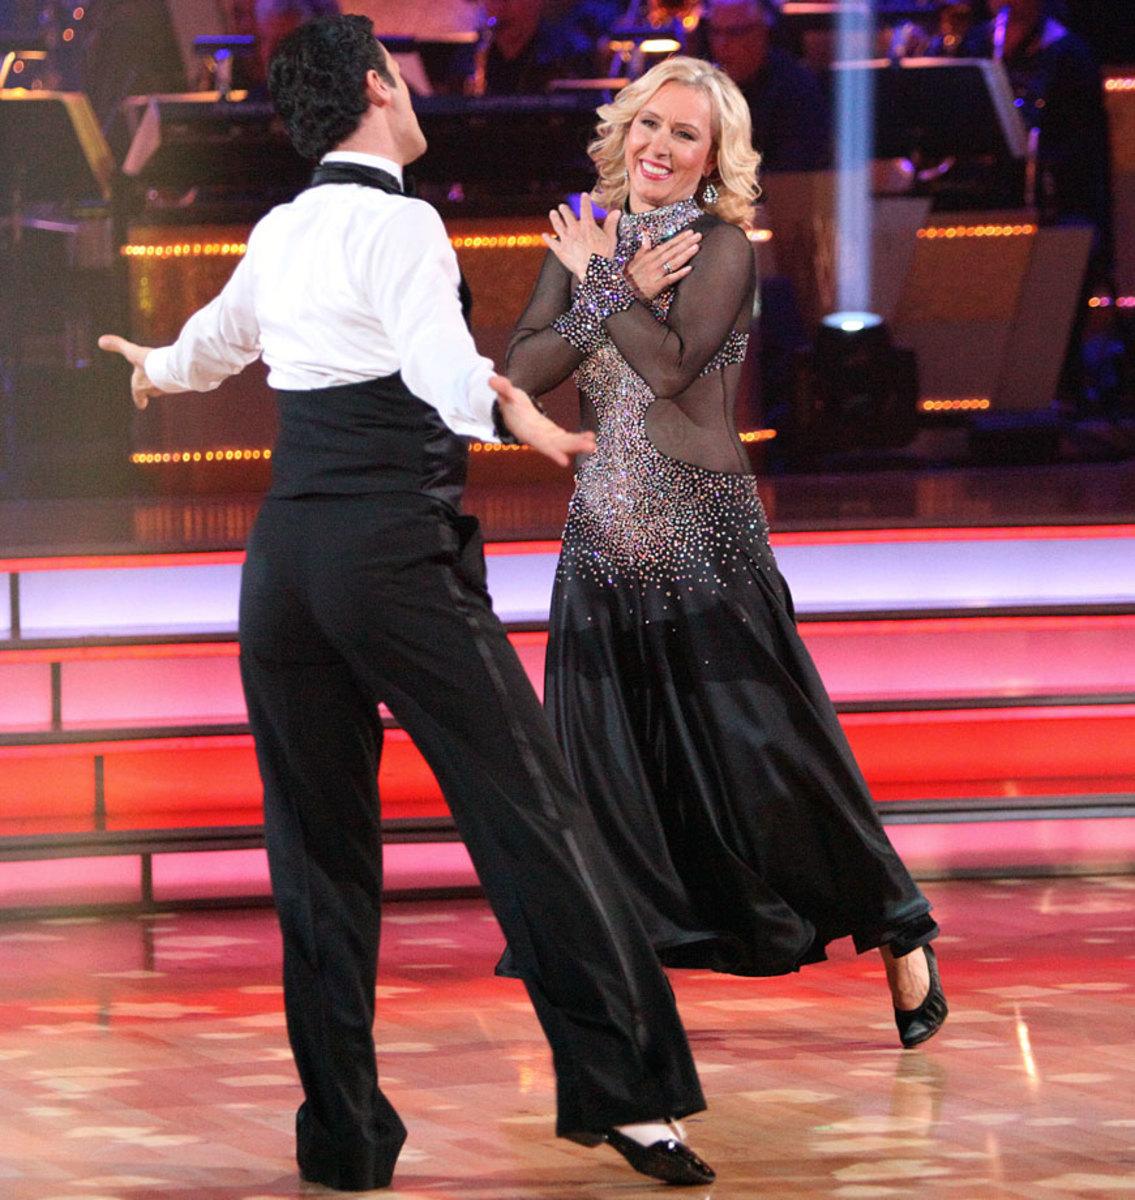 martina-navratilova-tony-dovolani-dancing-with-the-stars.jpg